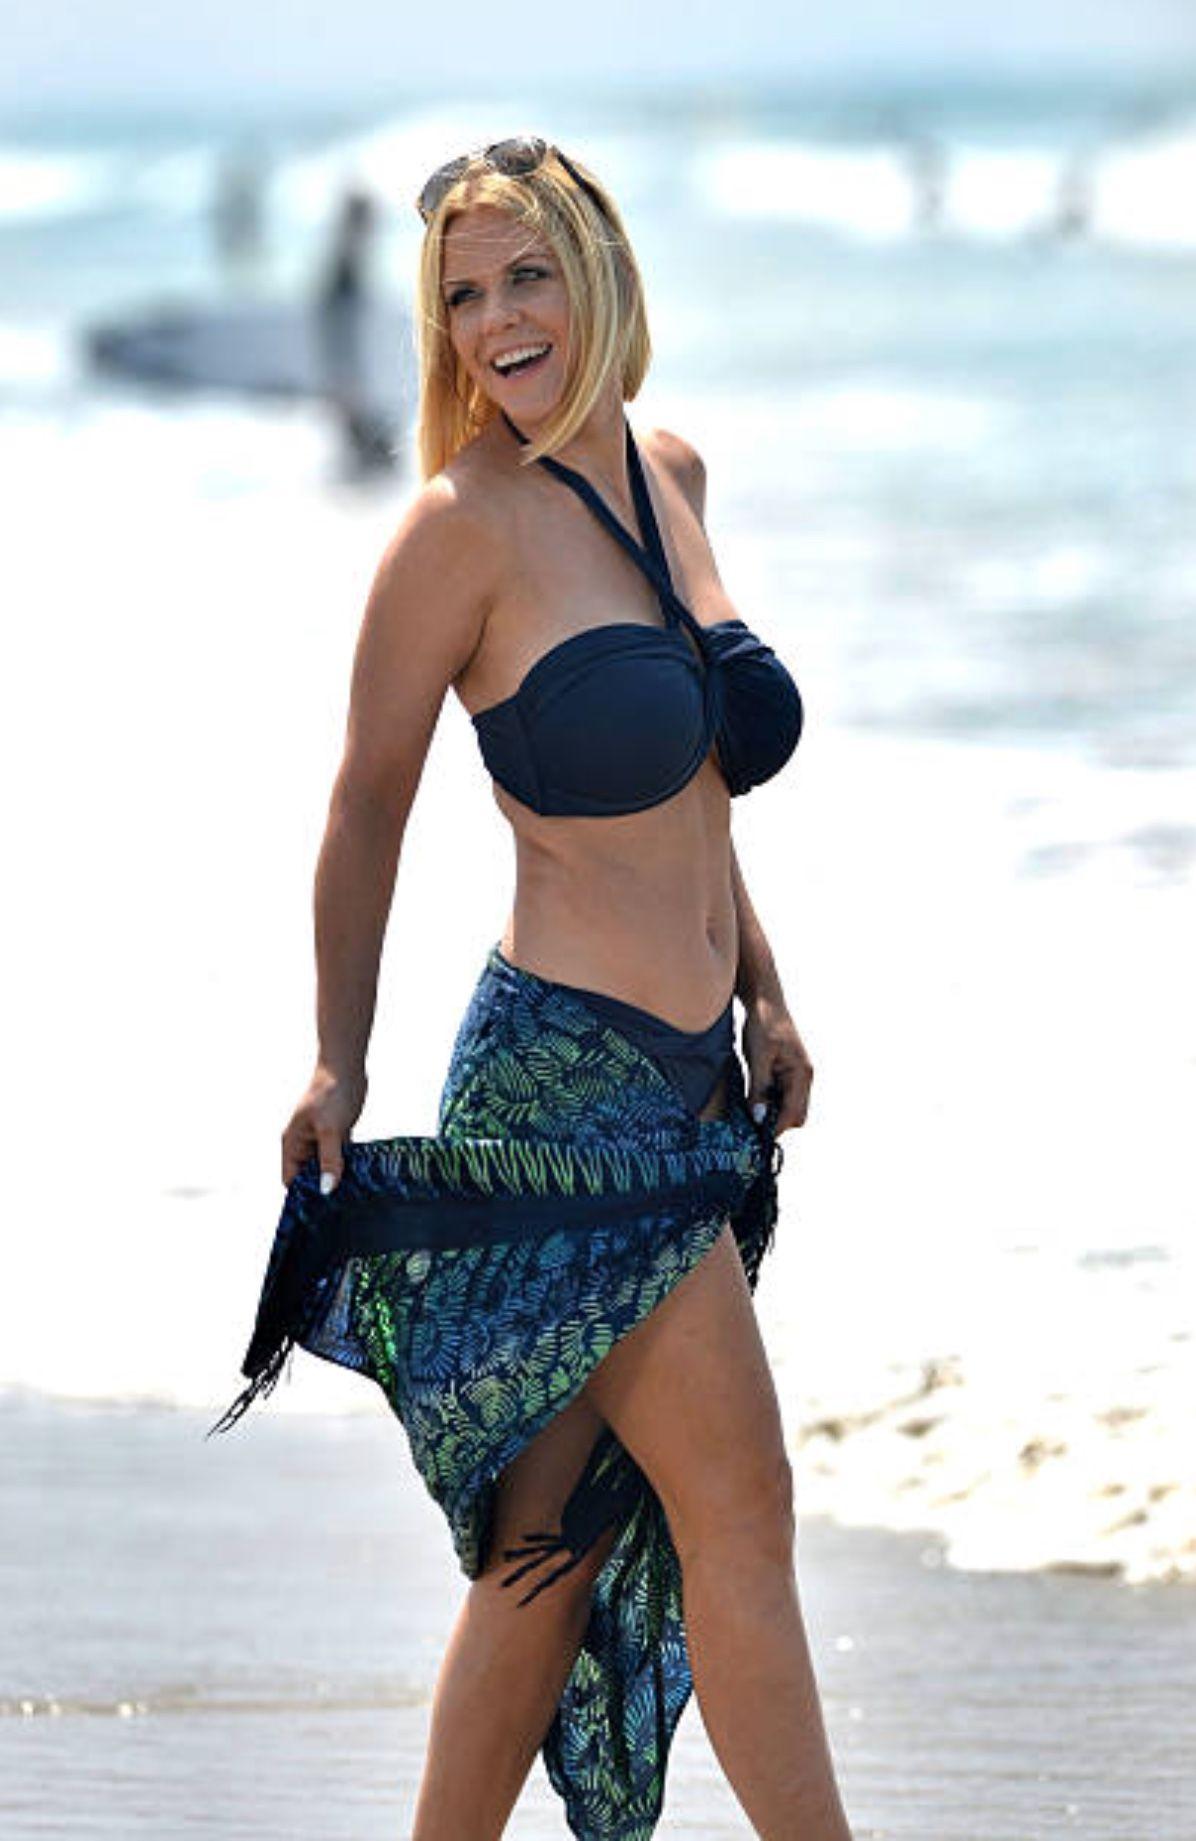 Bikini Carrie Keagan naked (68 foto and video), Pussy, Cleavage, Instagram, braless 2020